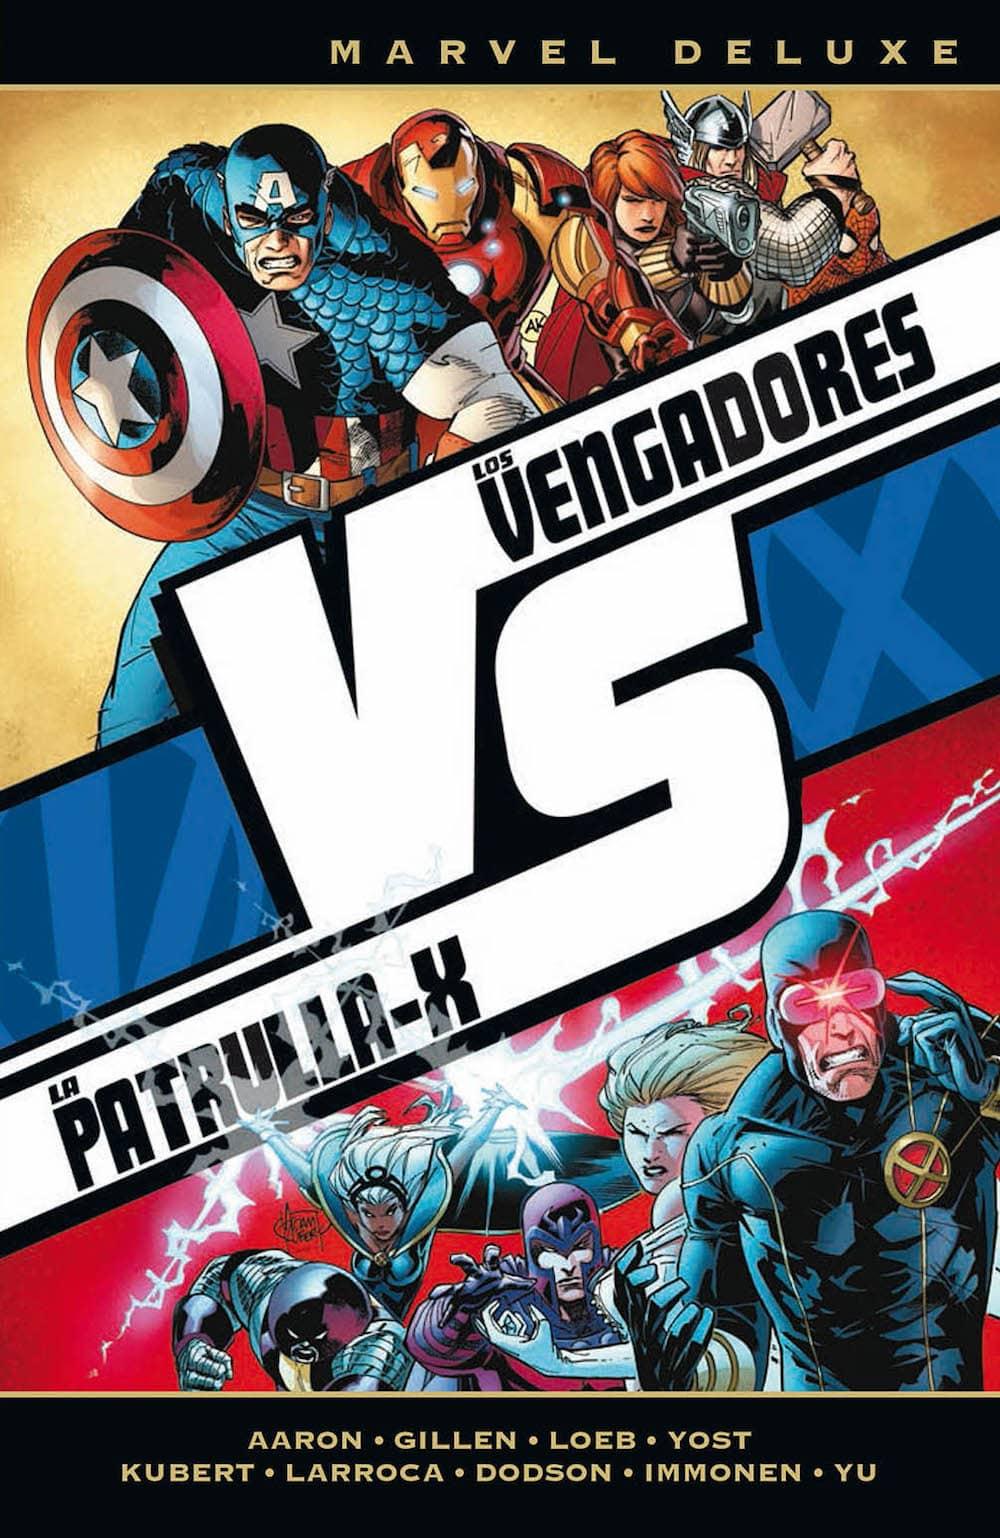 LOS VENGADORES VS LA PATRULLA-X : VS  (MARVEL DELUXE)